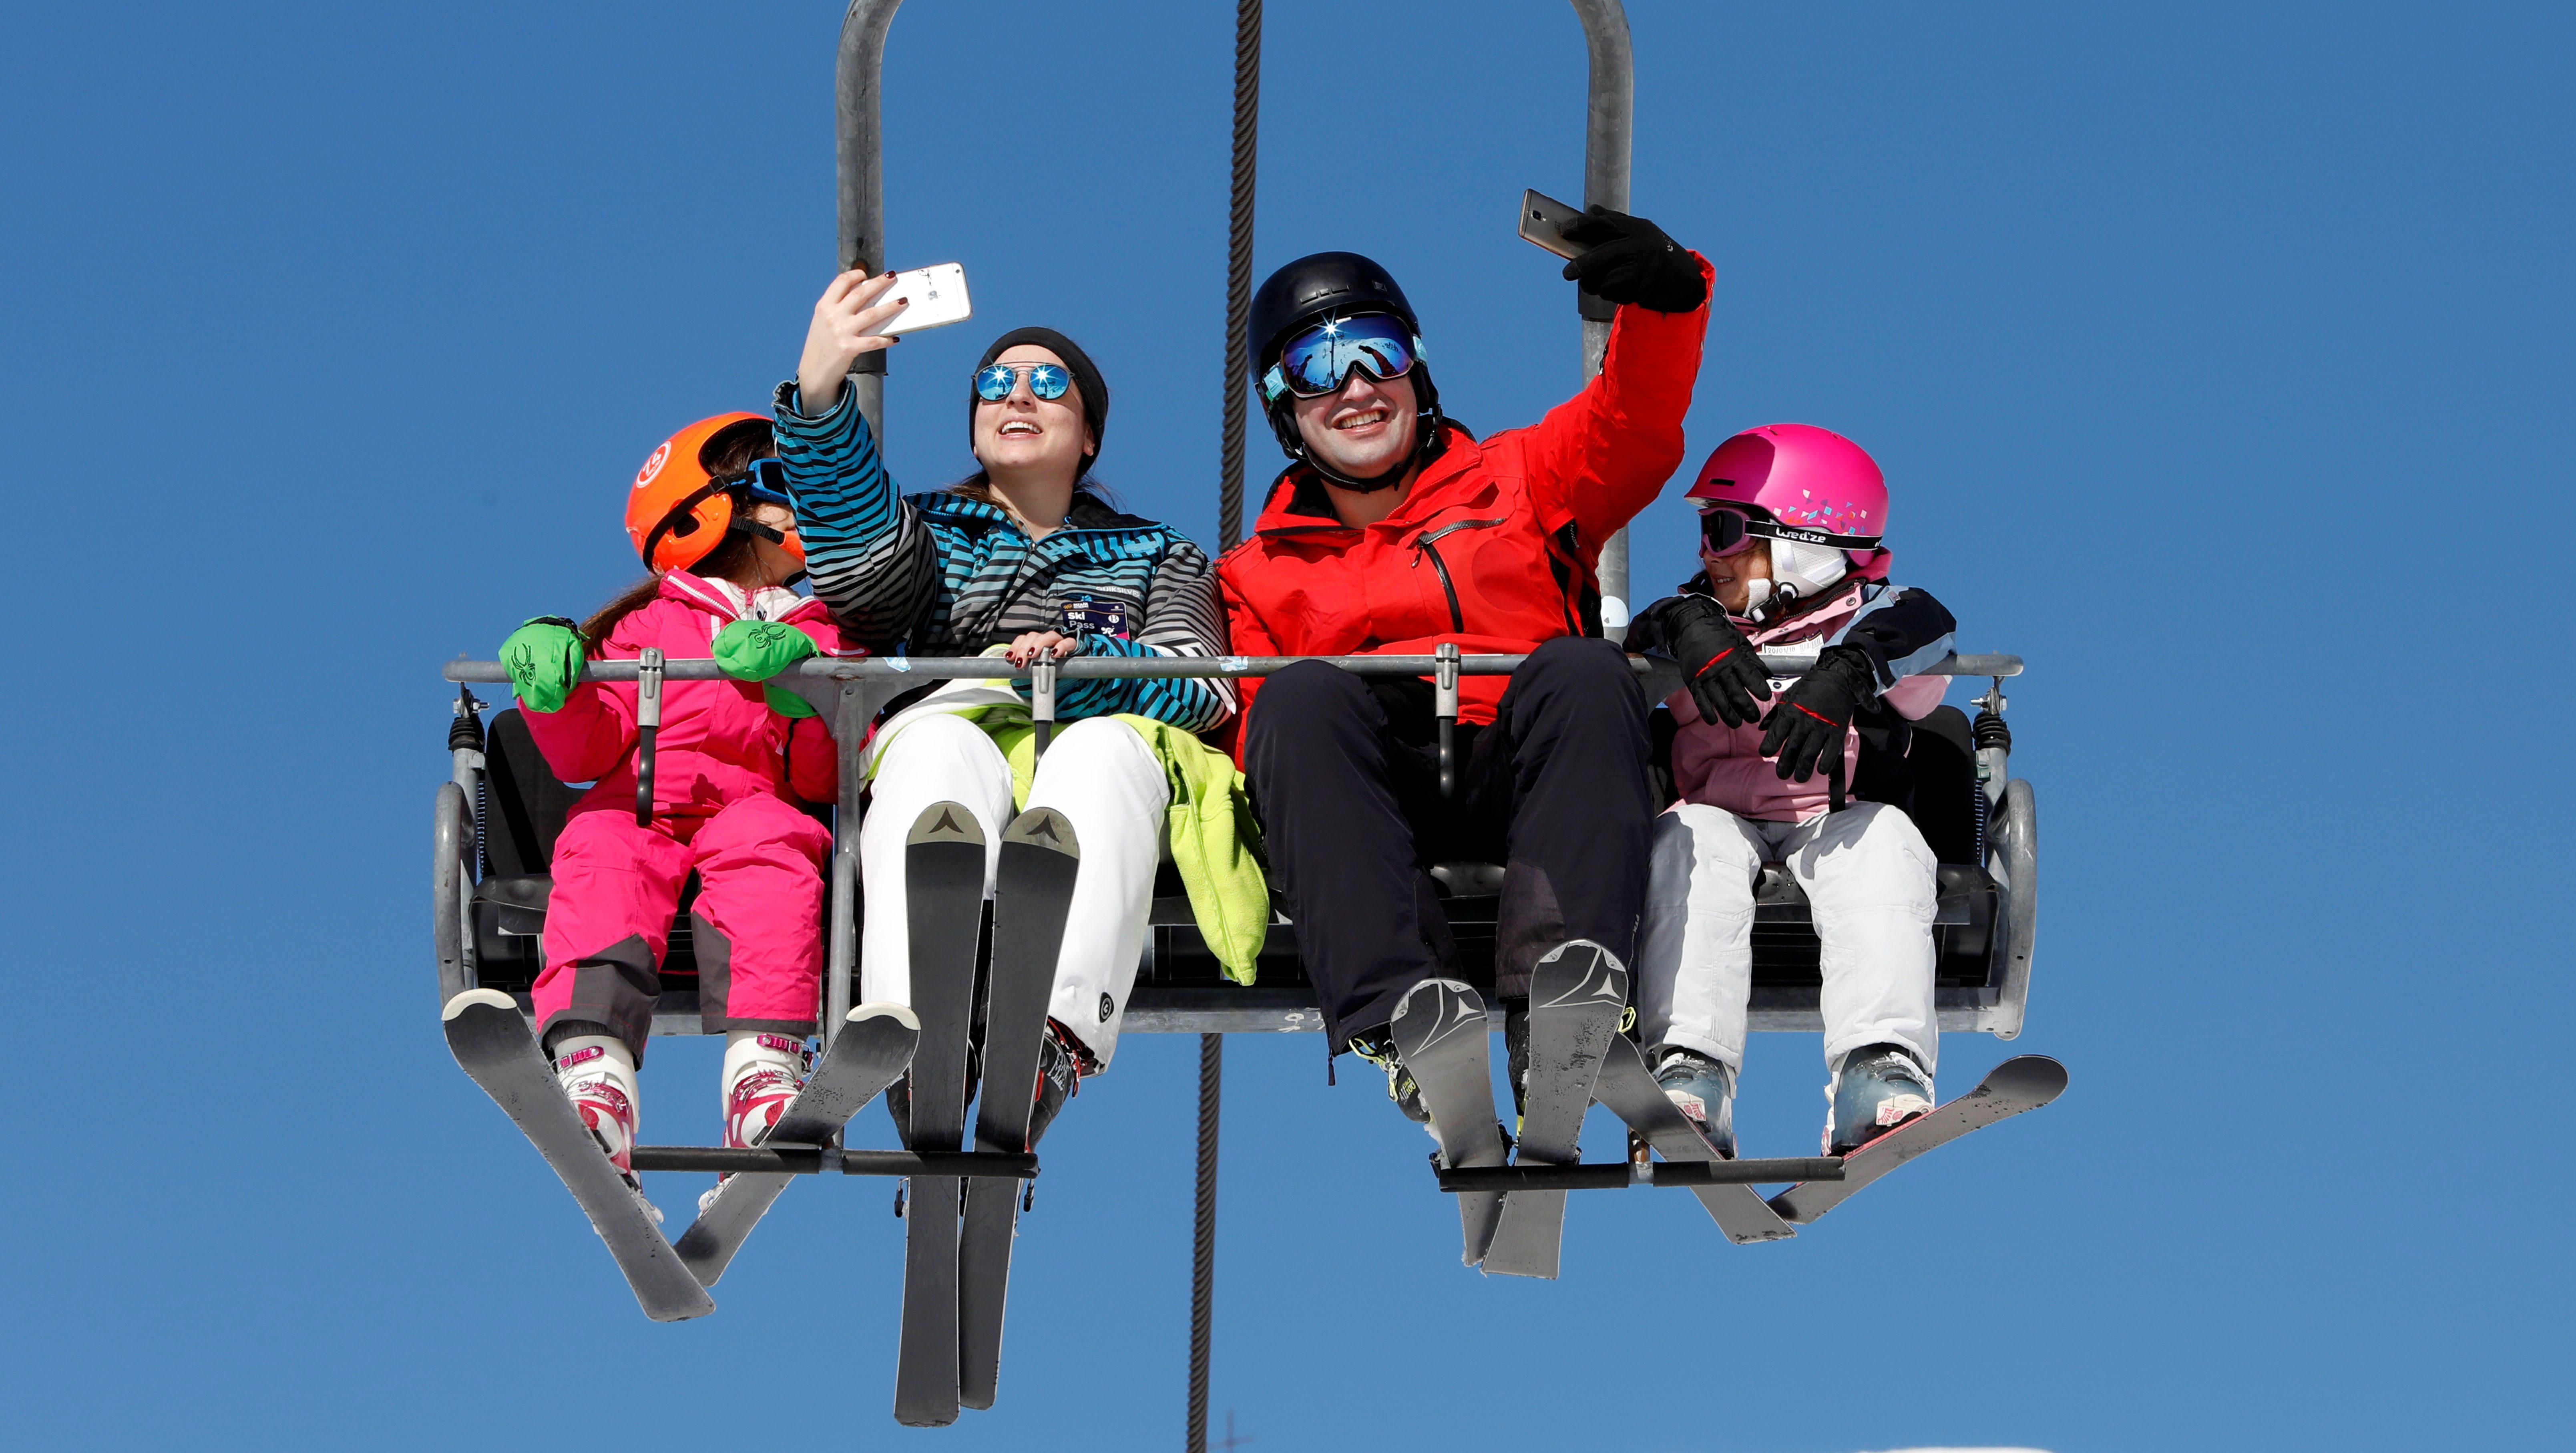 A couple takes selfies as they ride a ski lift at the Mzaar Ski Resort in Kfardebian, Lebanon January 20, 2018. REUTERS/Jamal Saidi - RC160A11D500